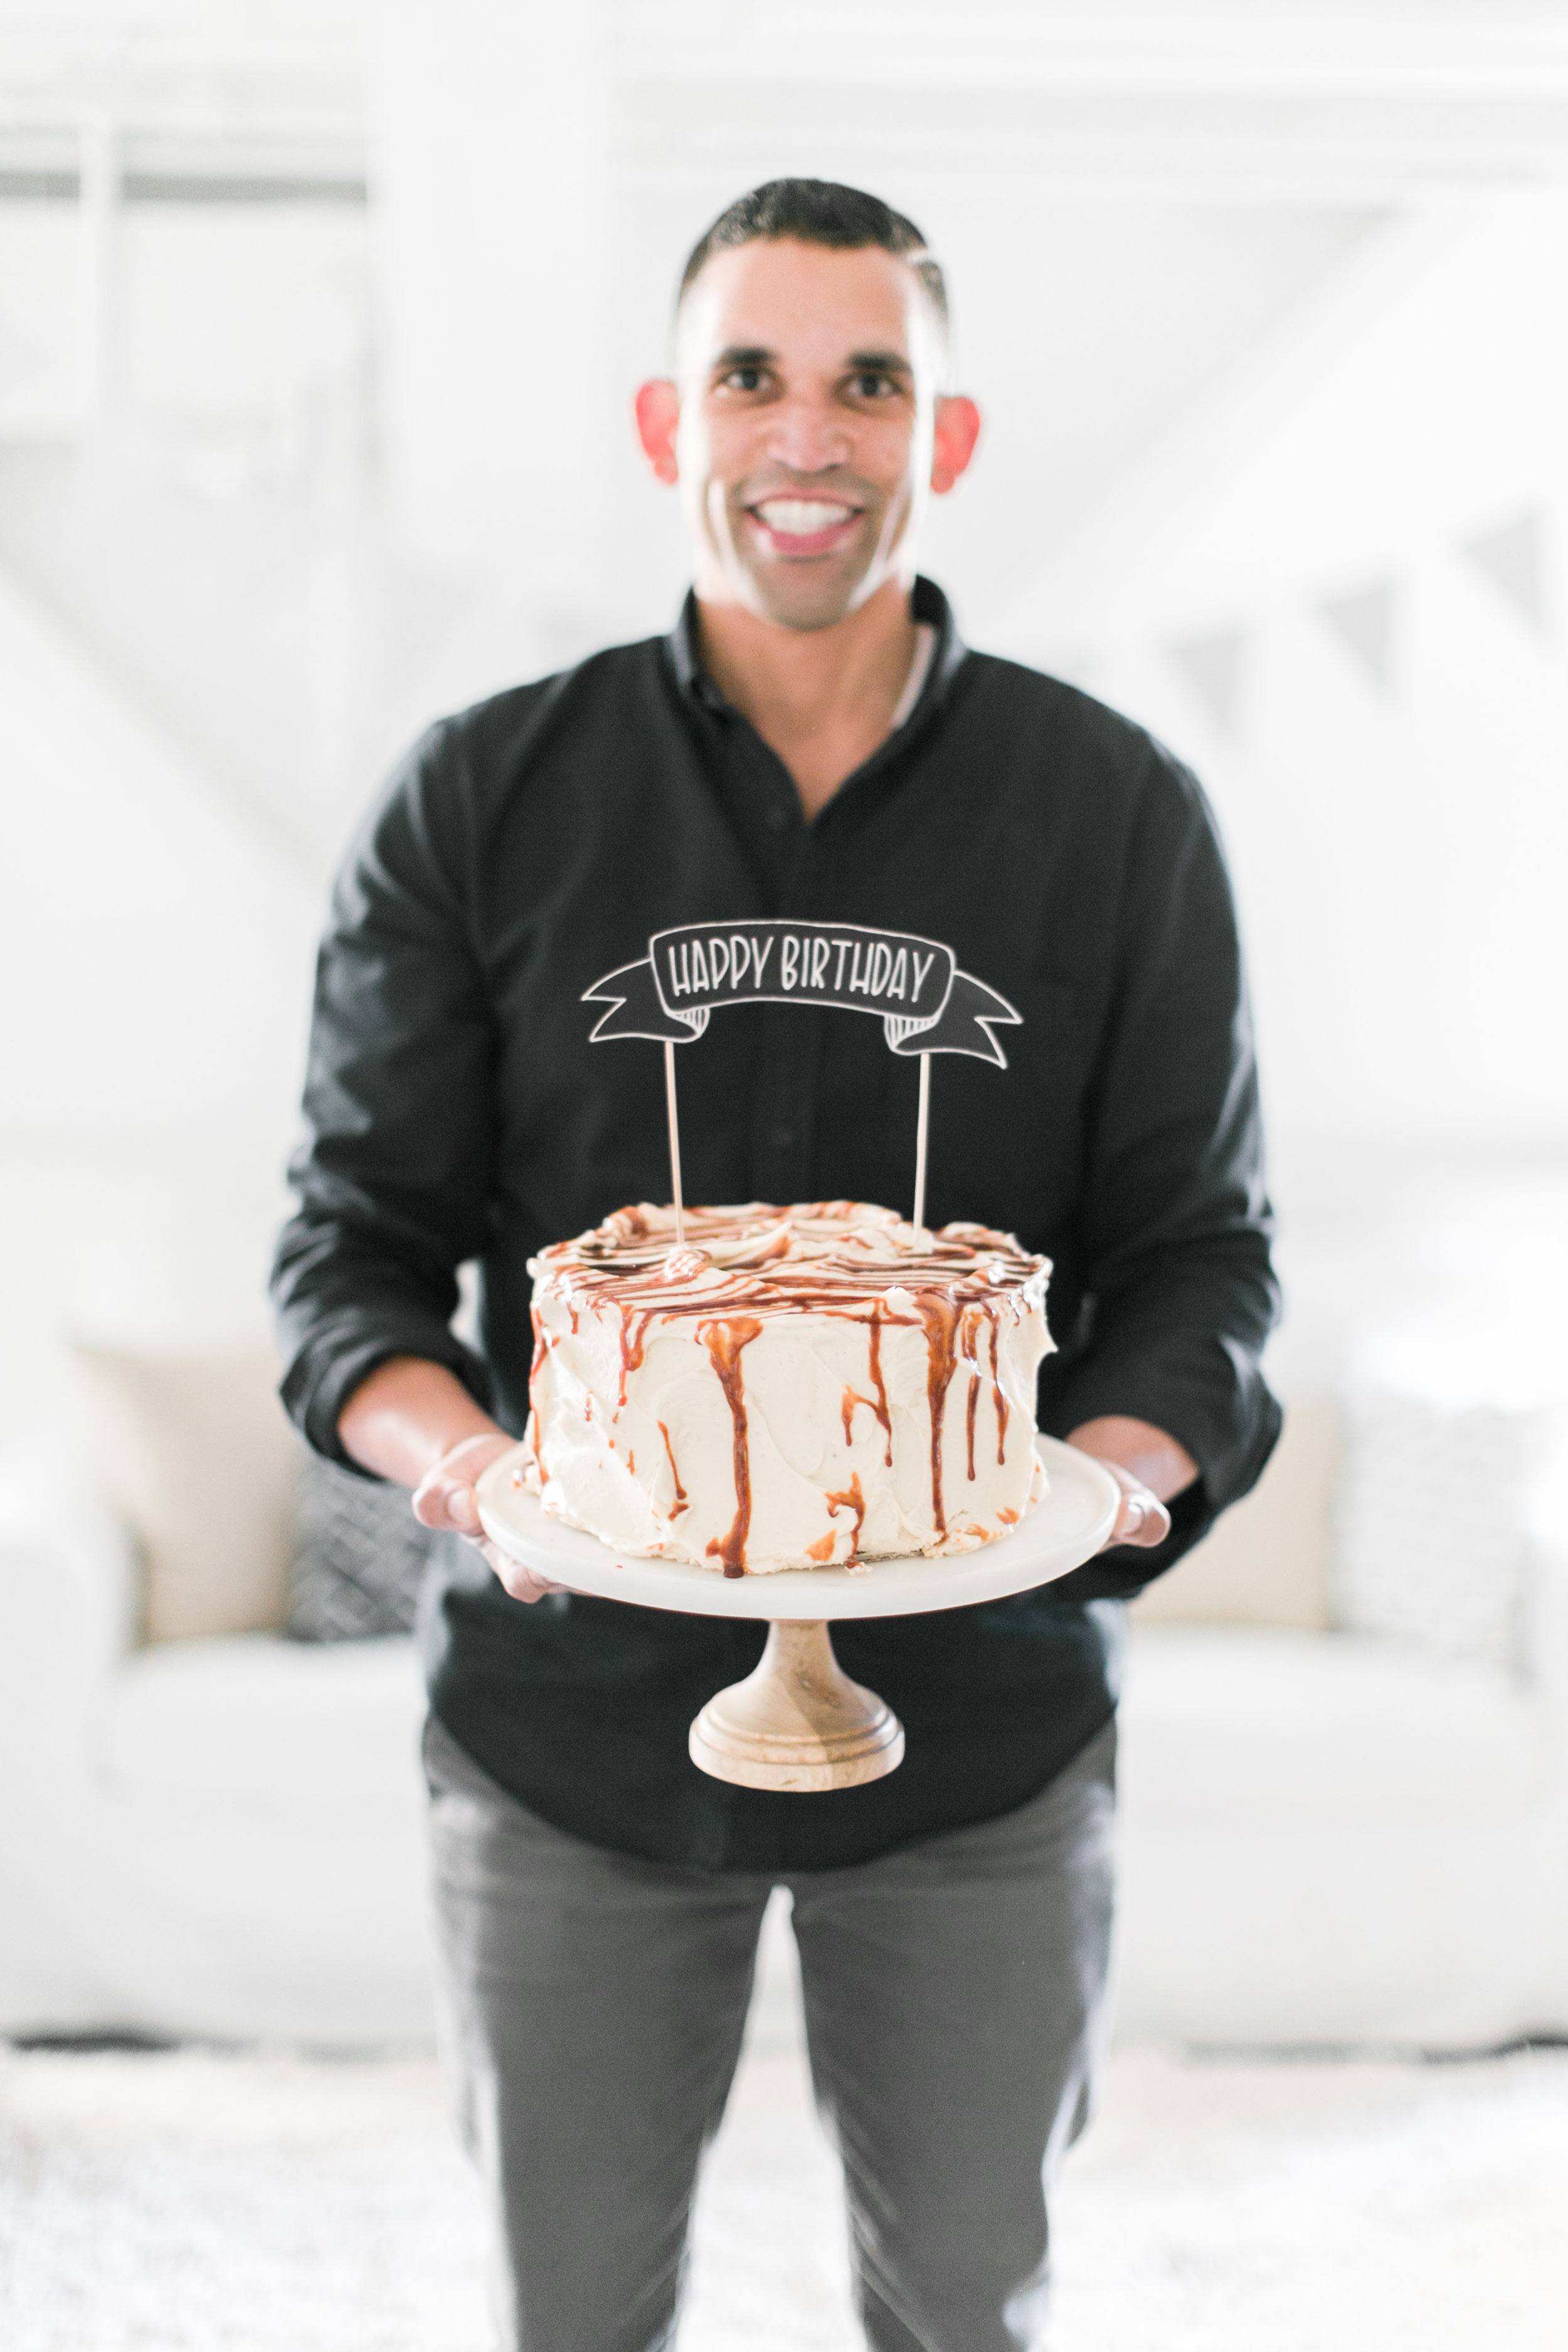 STEVE DISPLAYING OUR CUSTOM CAKE TOPPER.